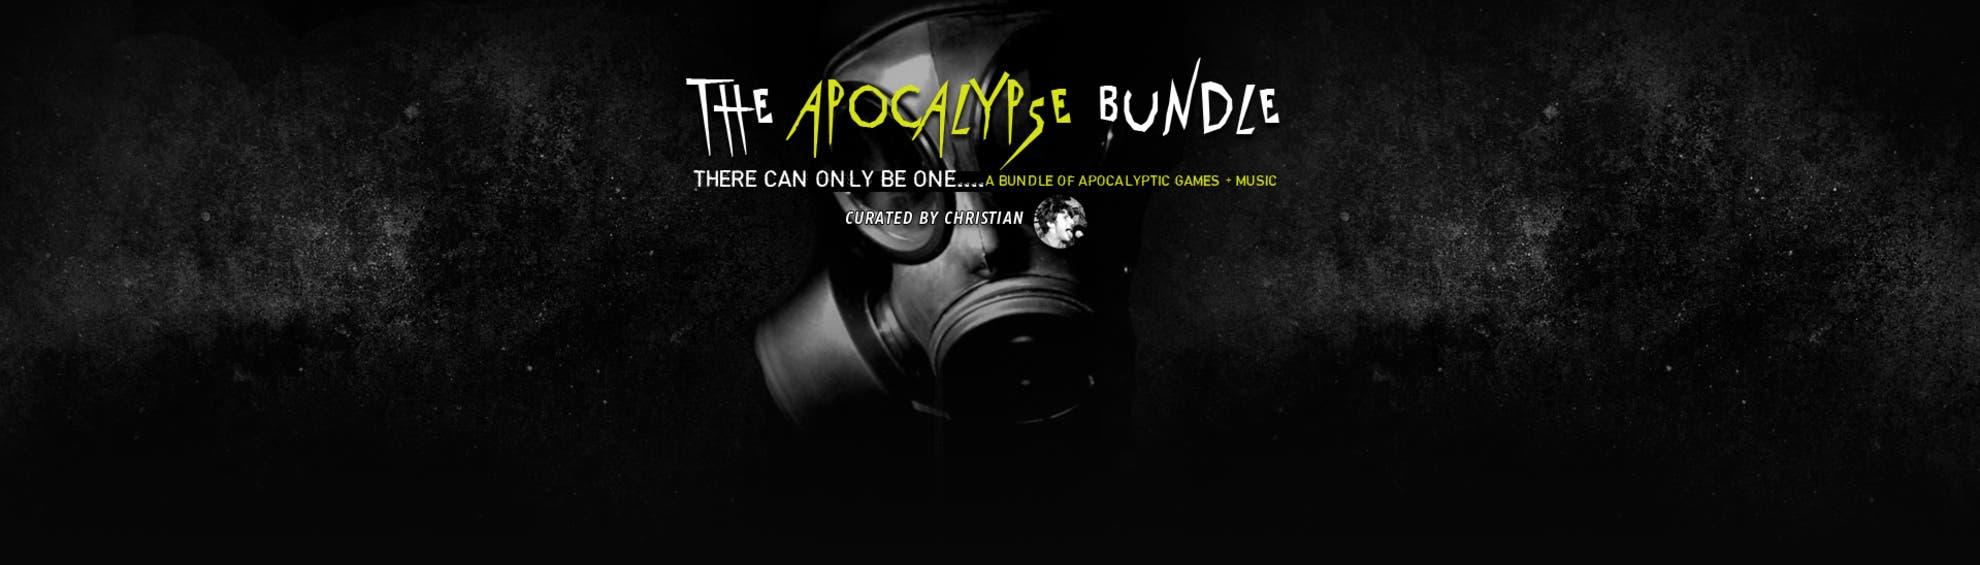 Apocalypse bundle groupees